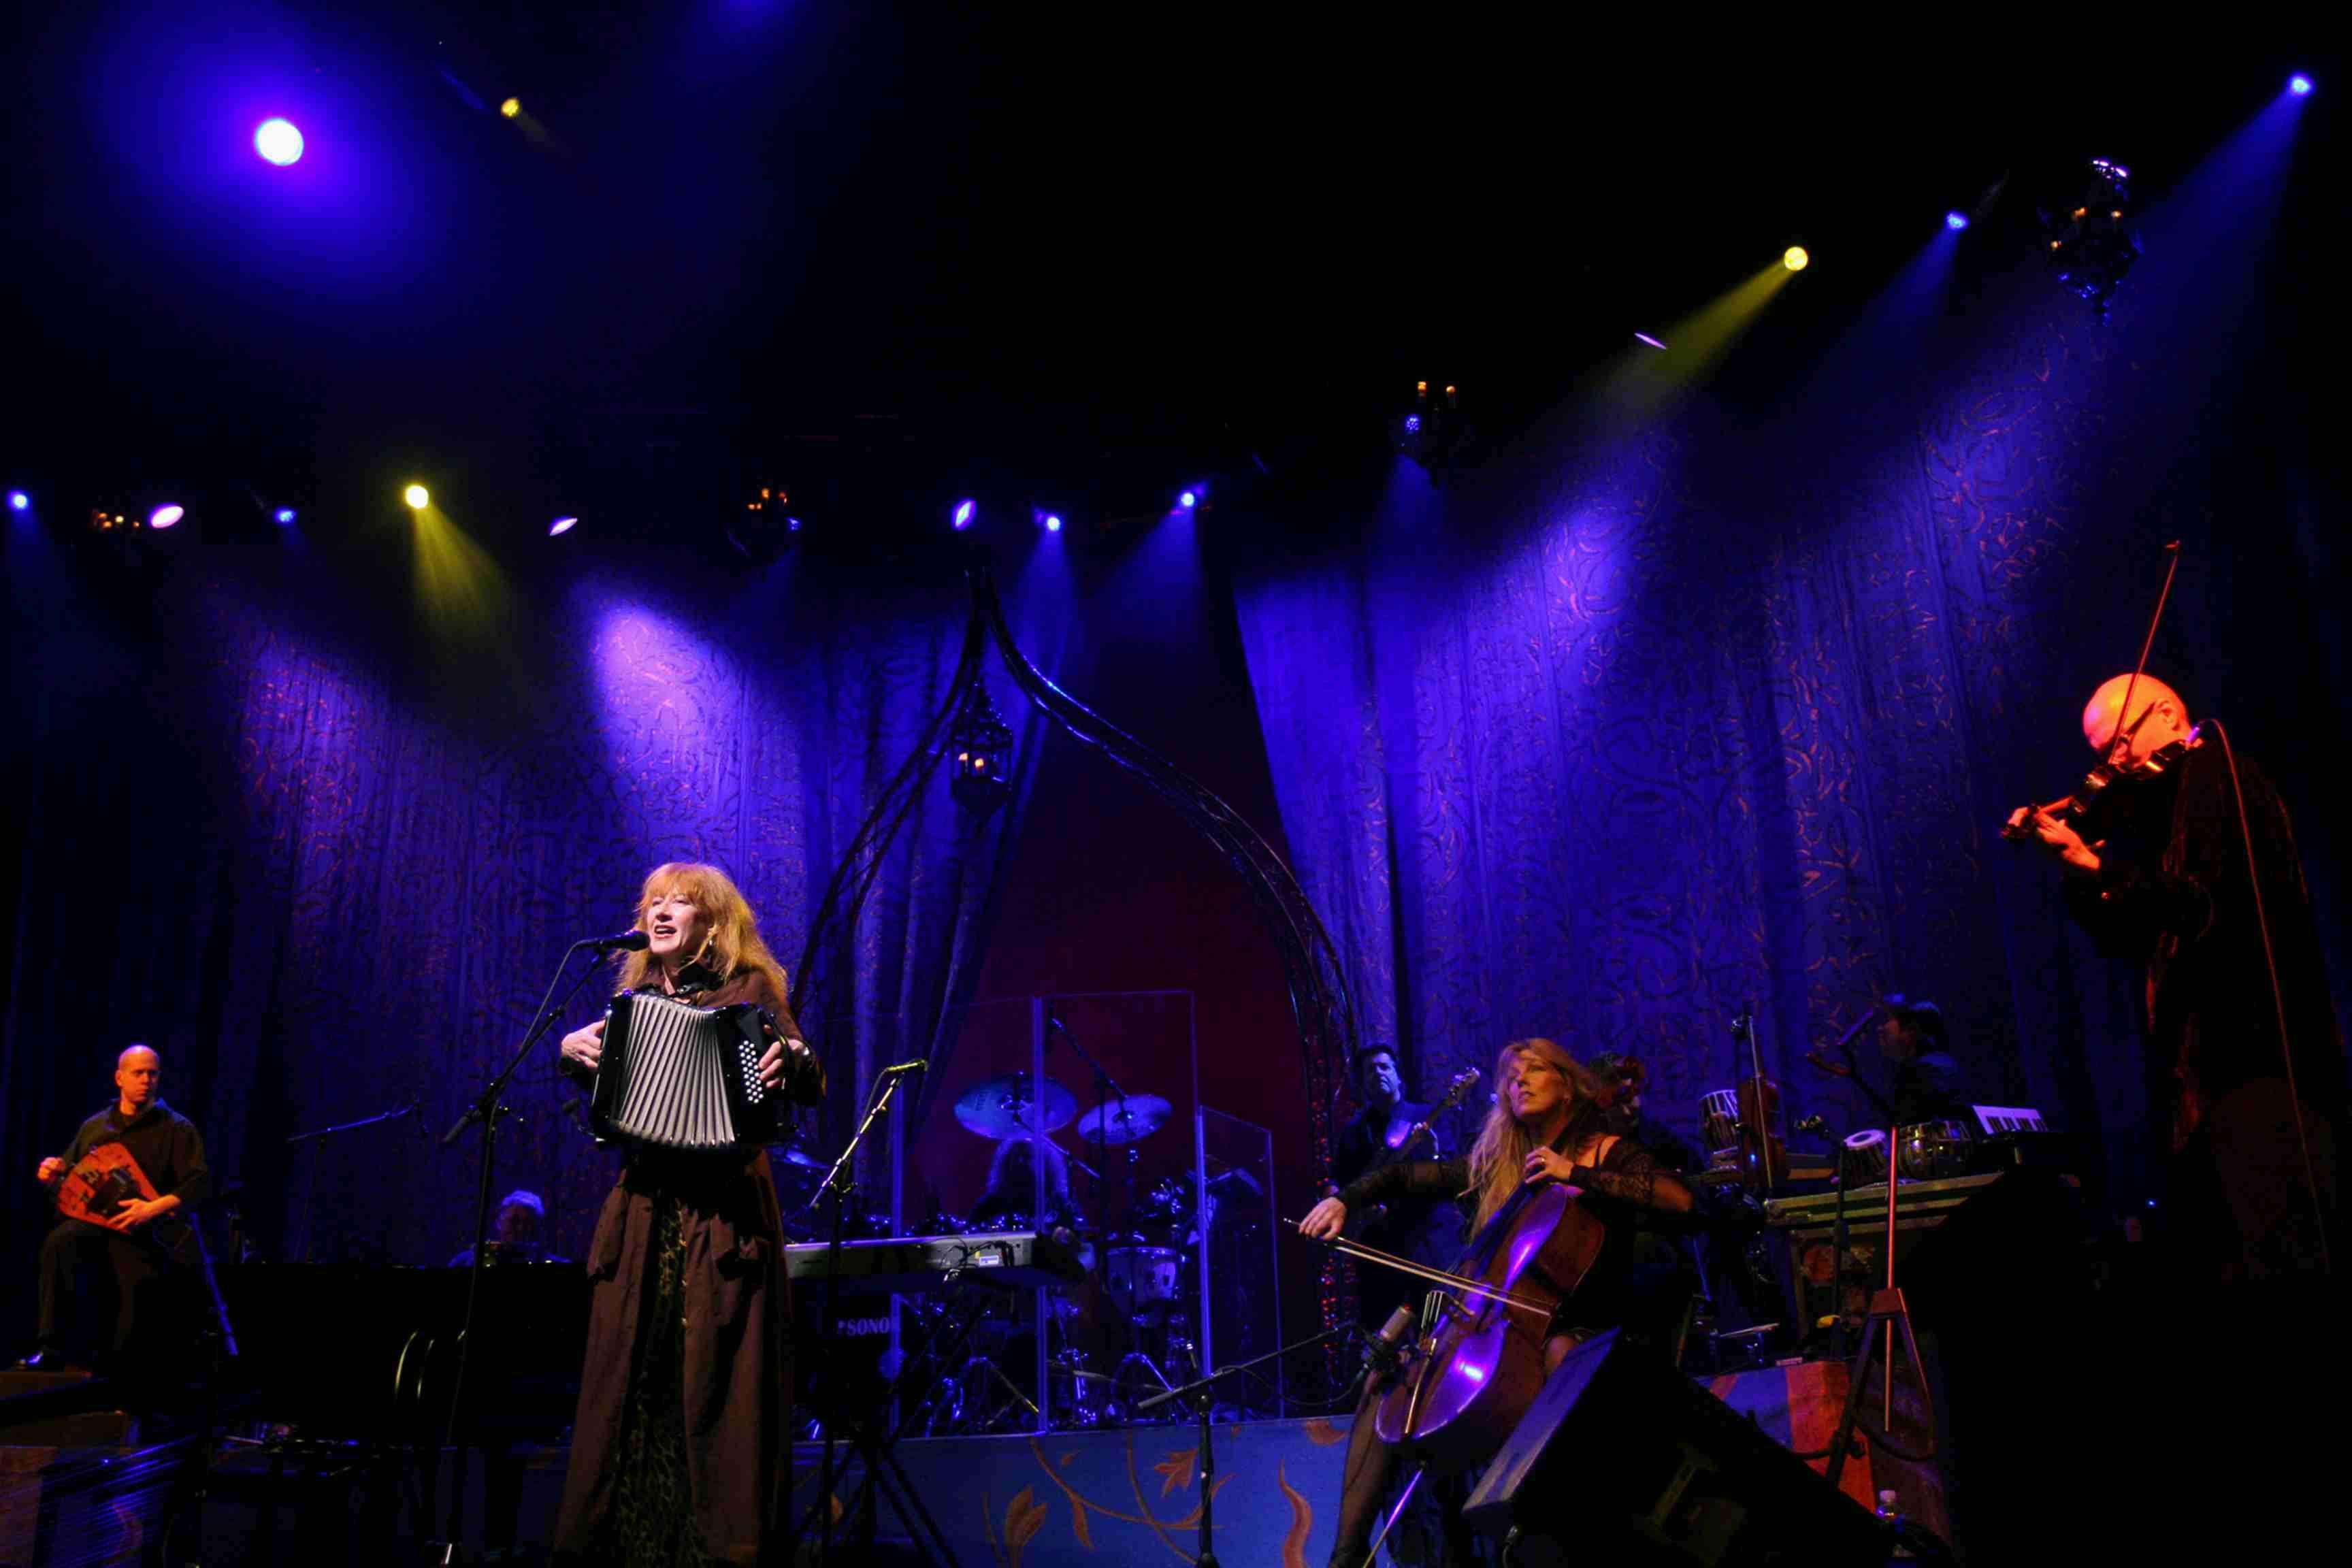 Loreena McKennitt performing